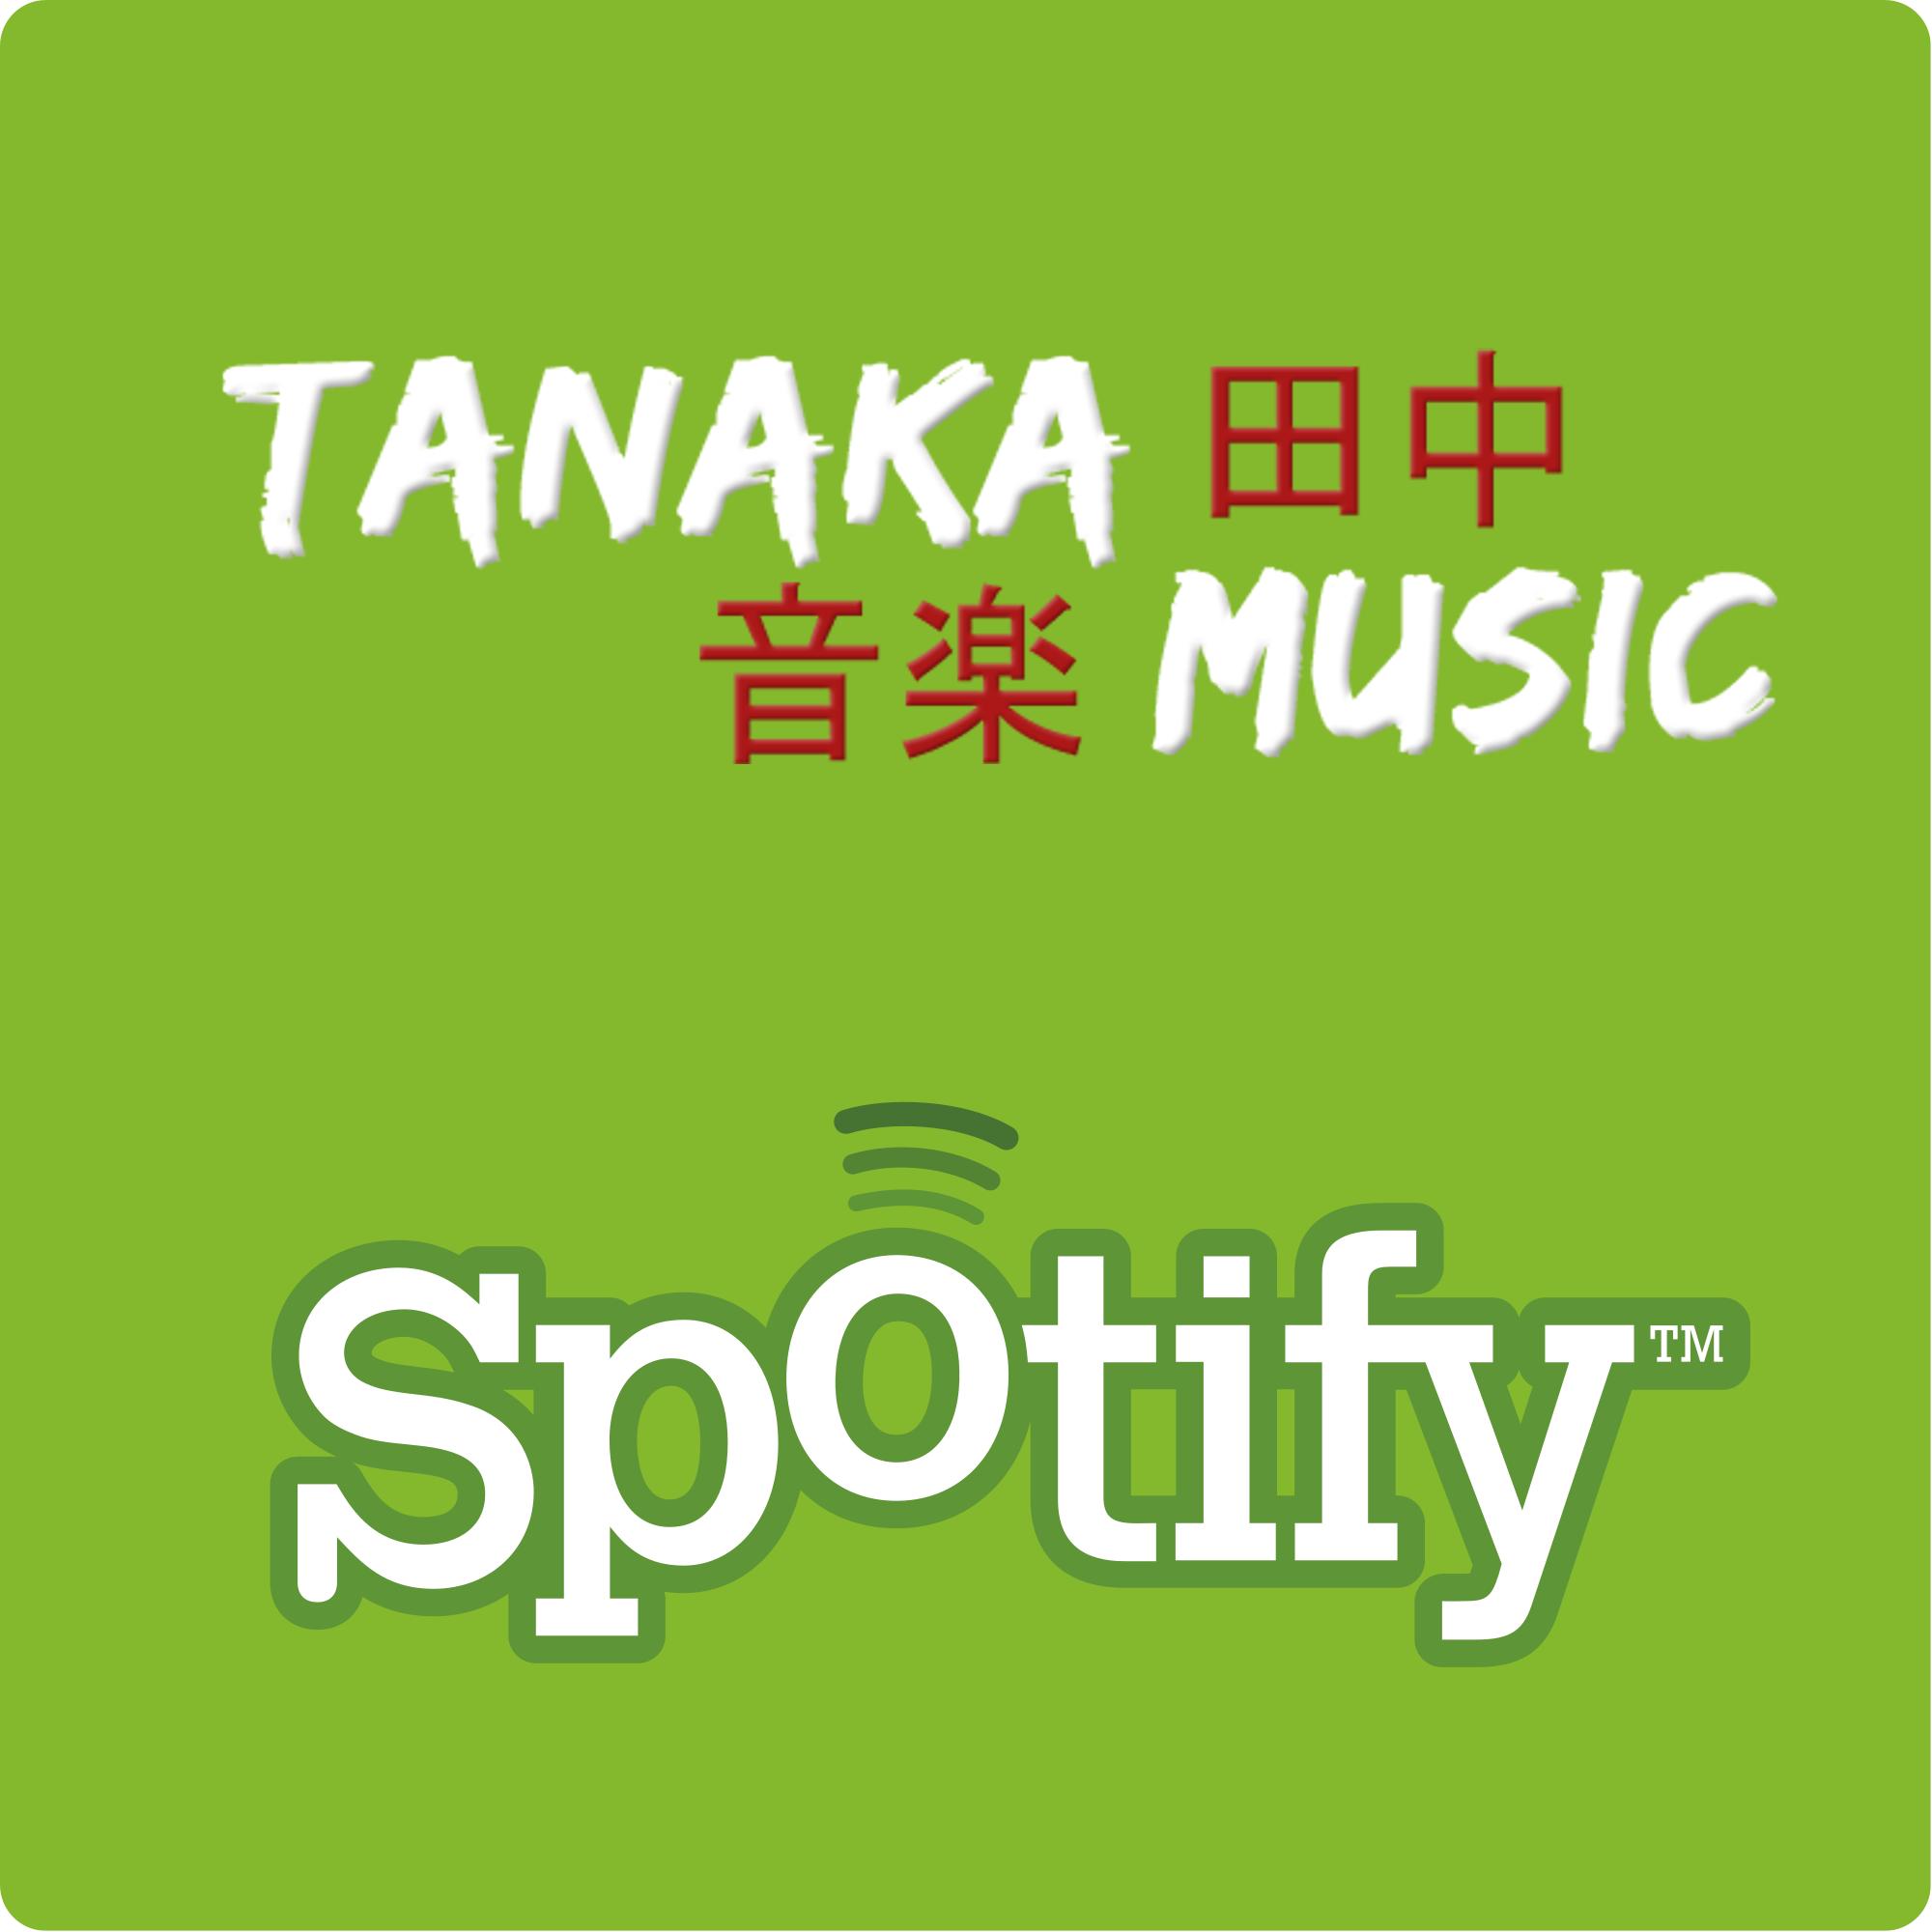 Spotify & Tanaka Music (Love)